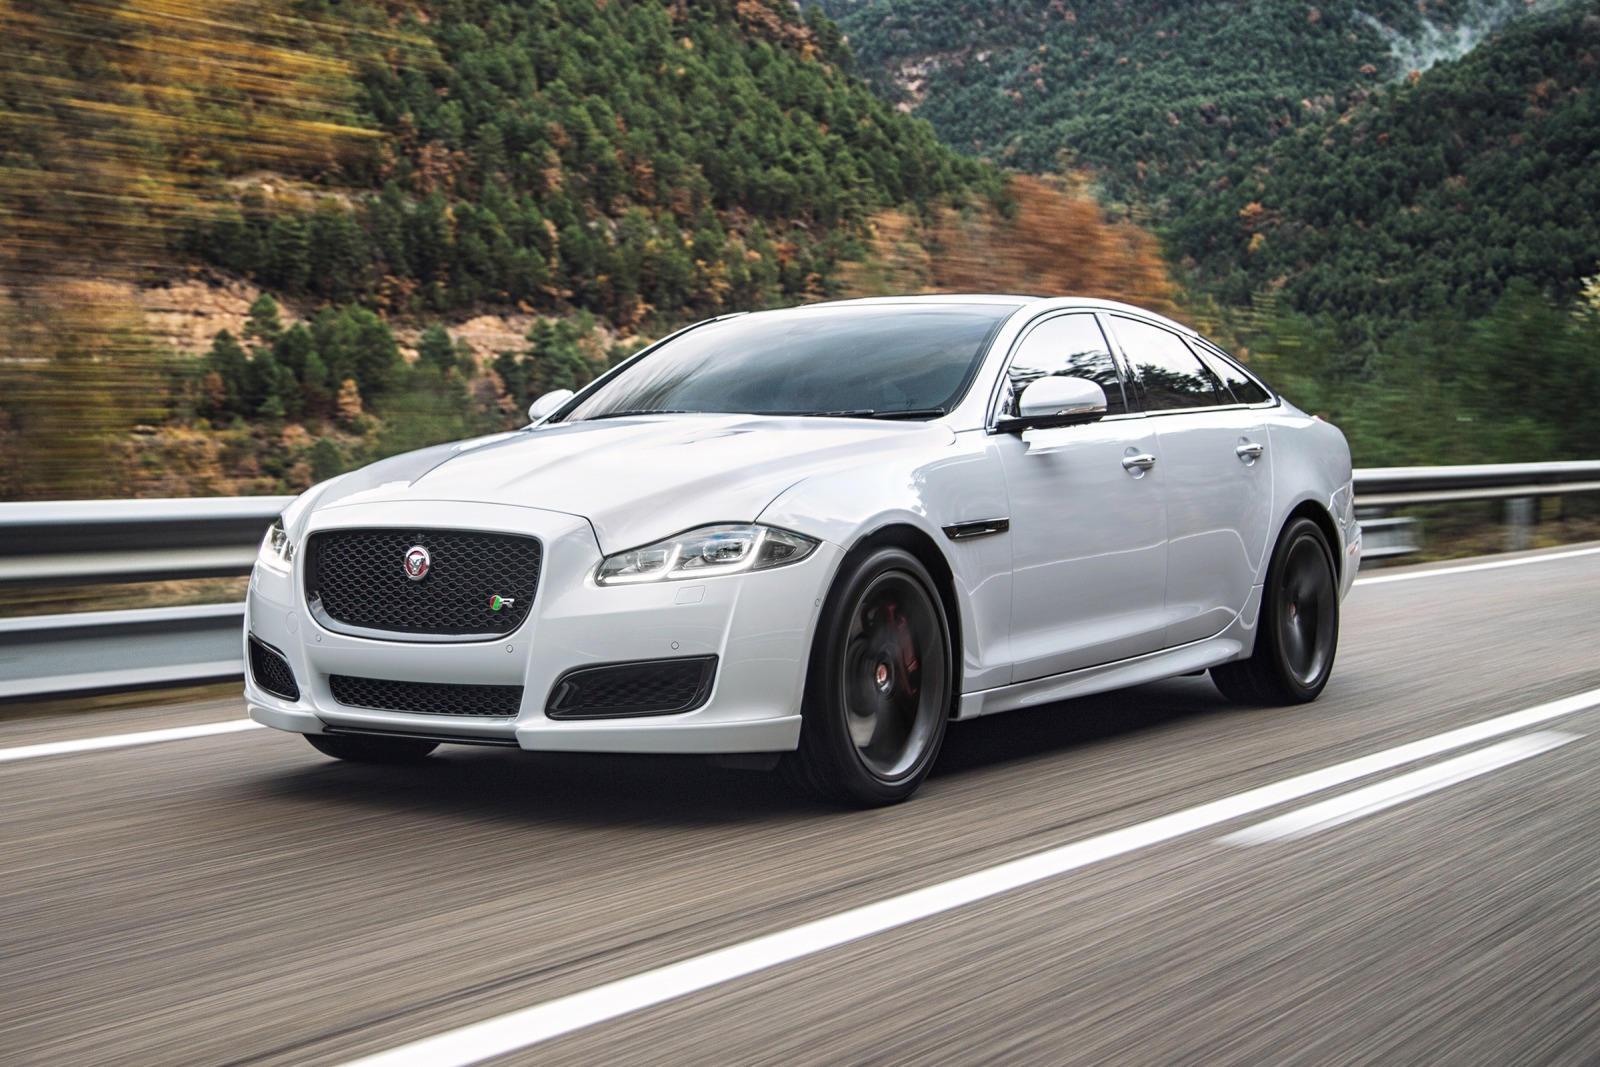 2017 Jaguar XJR: Review, Trims, Specs, Price, New Interior ...